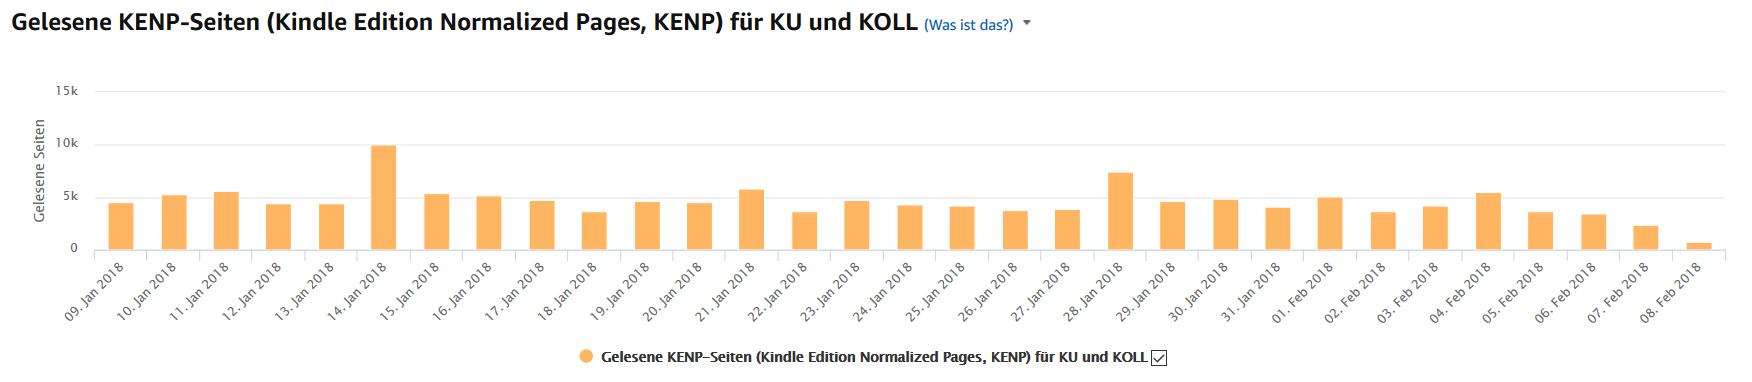 Geld verdienen mit Kindle eBooks KU KENP KOLL